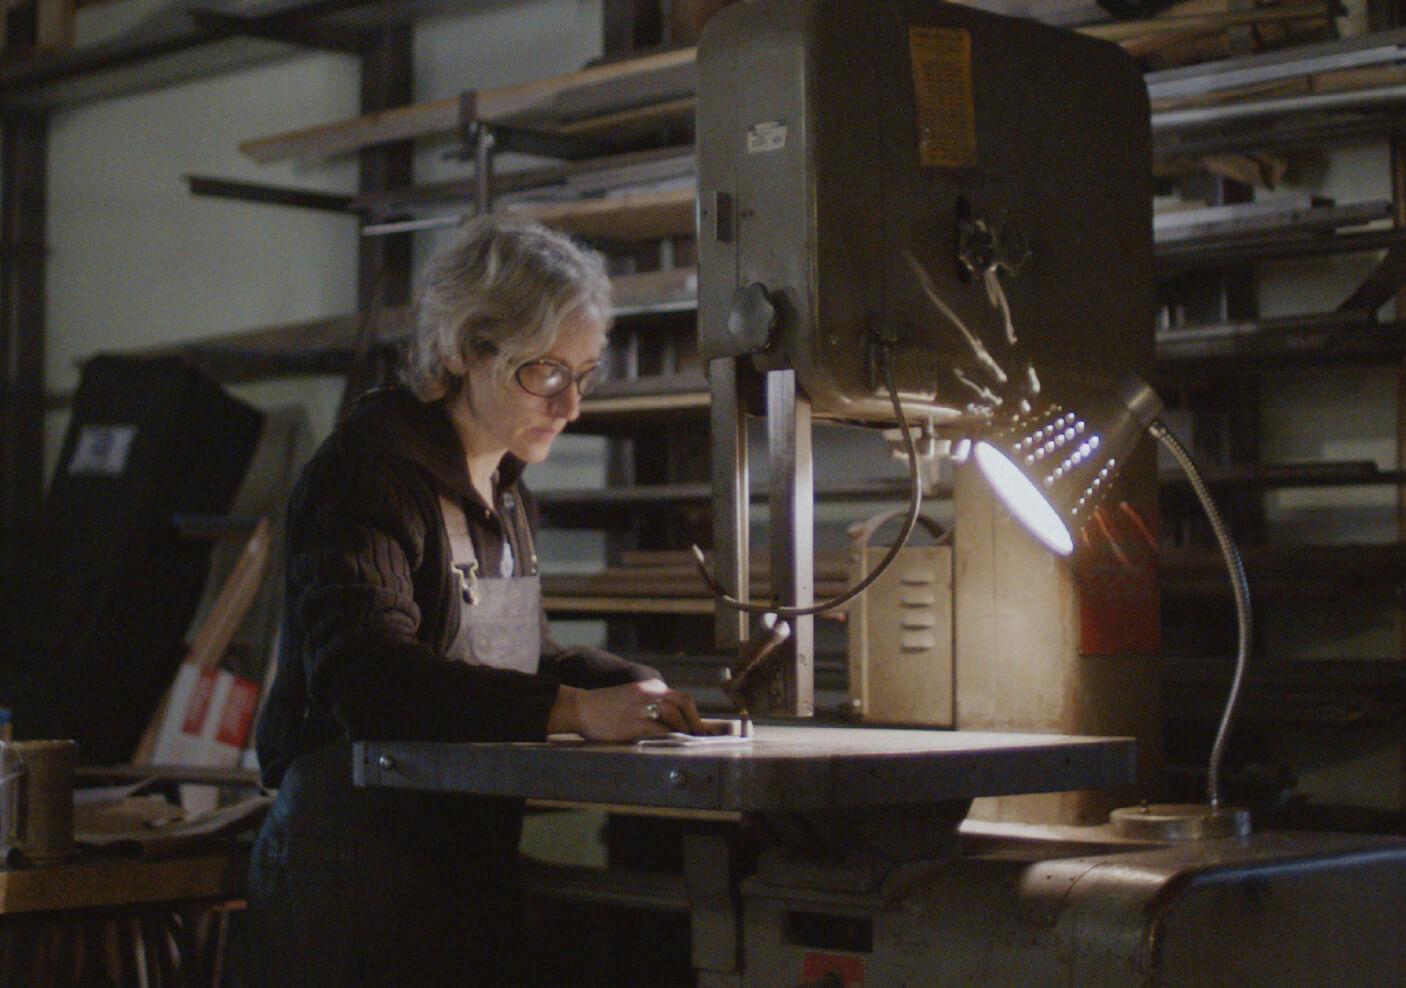 Erica focusing on her work in her shop.